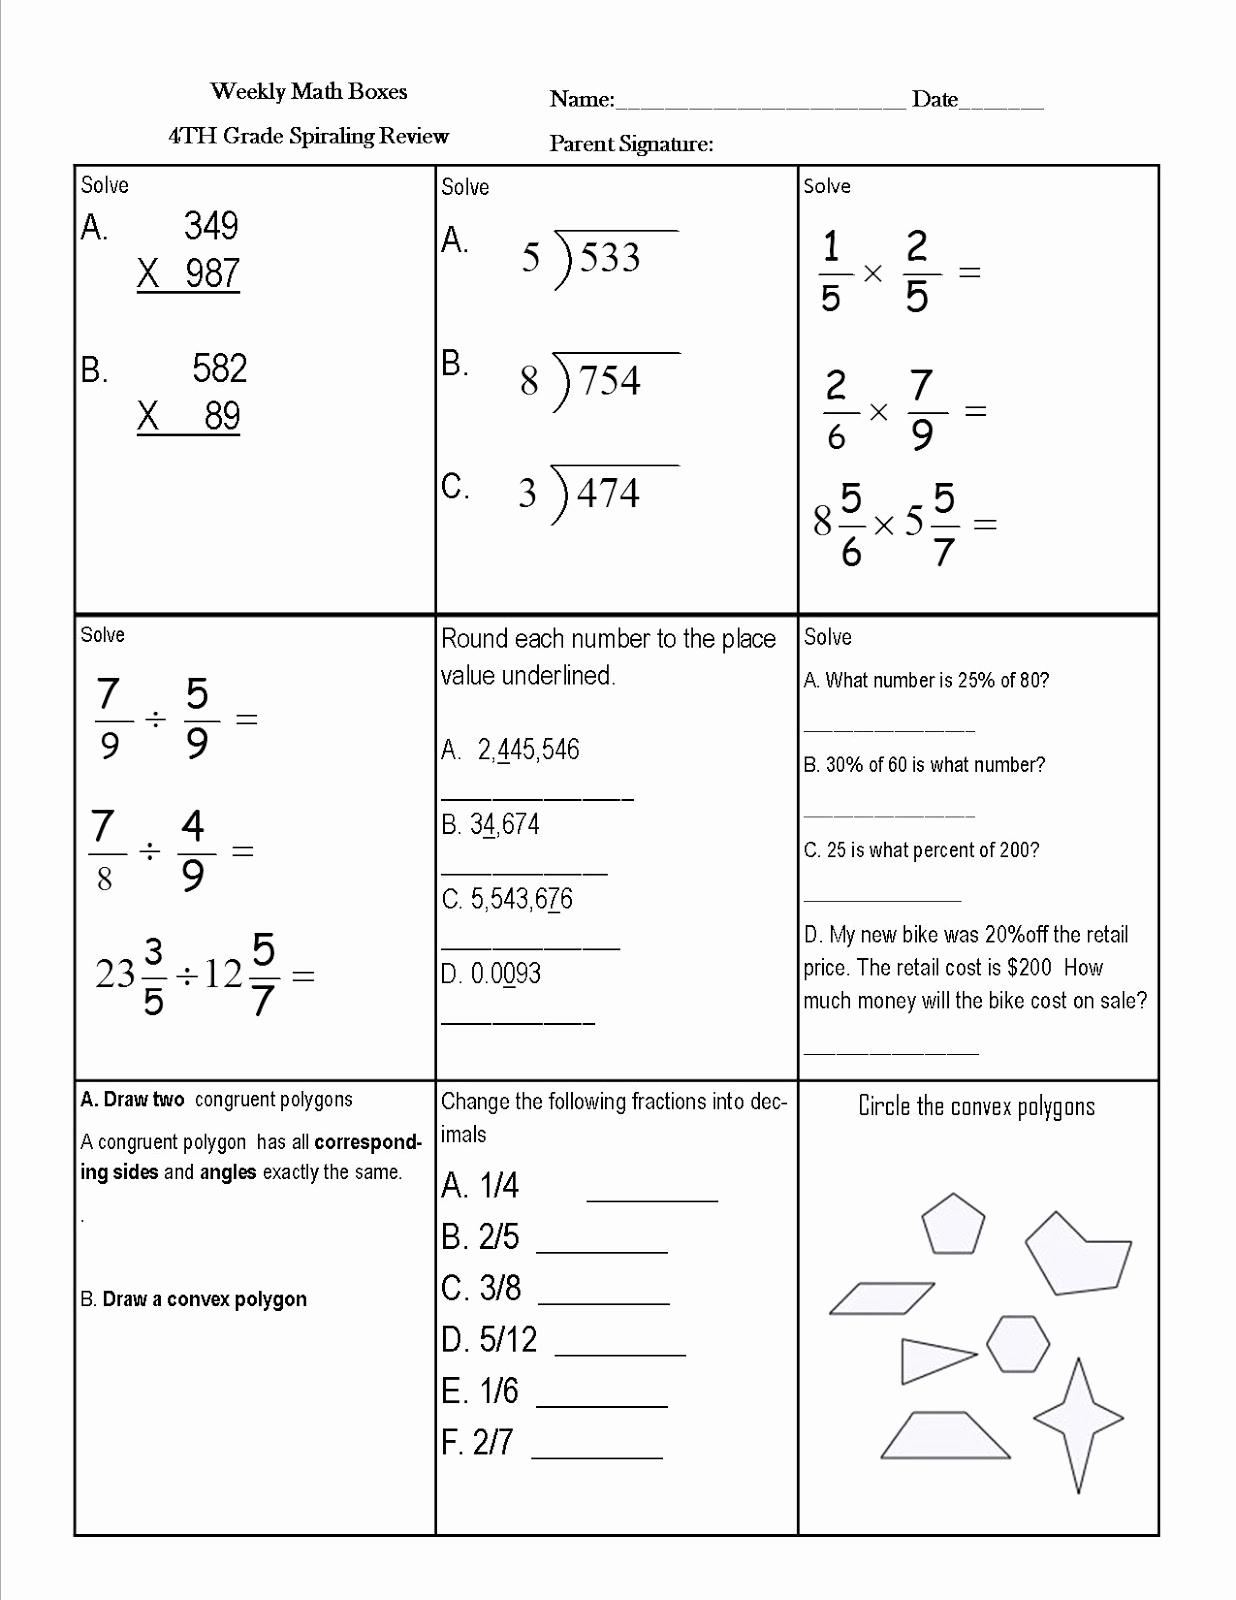 Nwea Math Practice Worksheets Awesome 20 Nwea Math Practice Worksheets